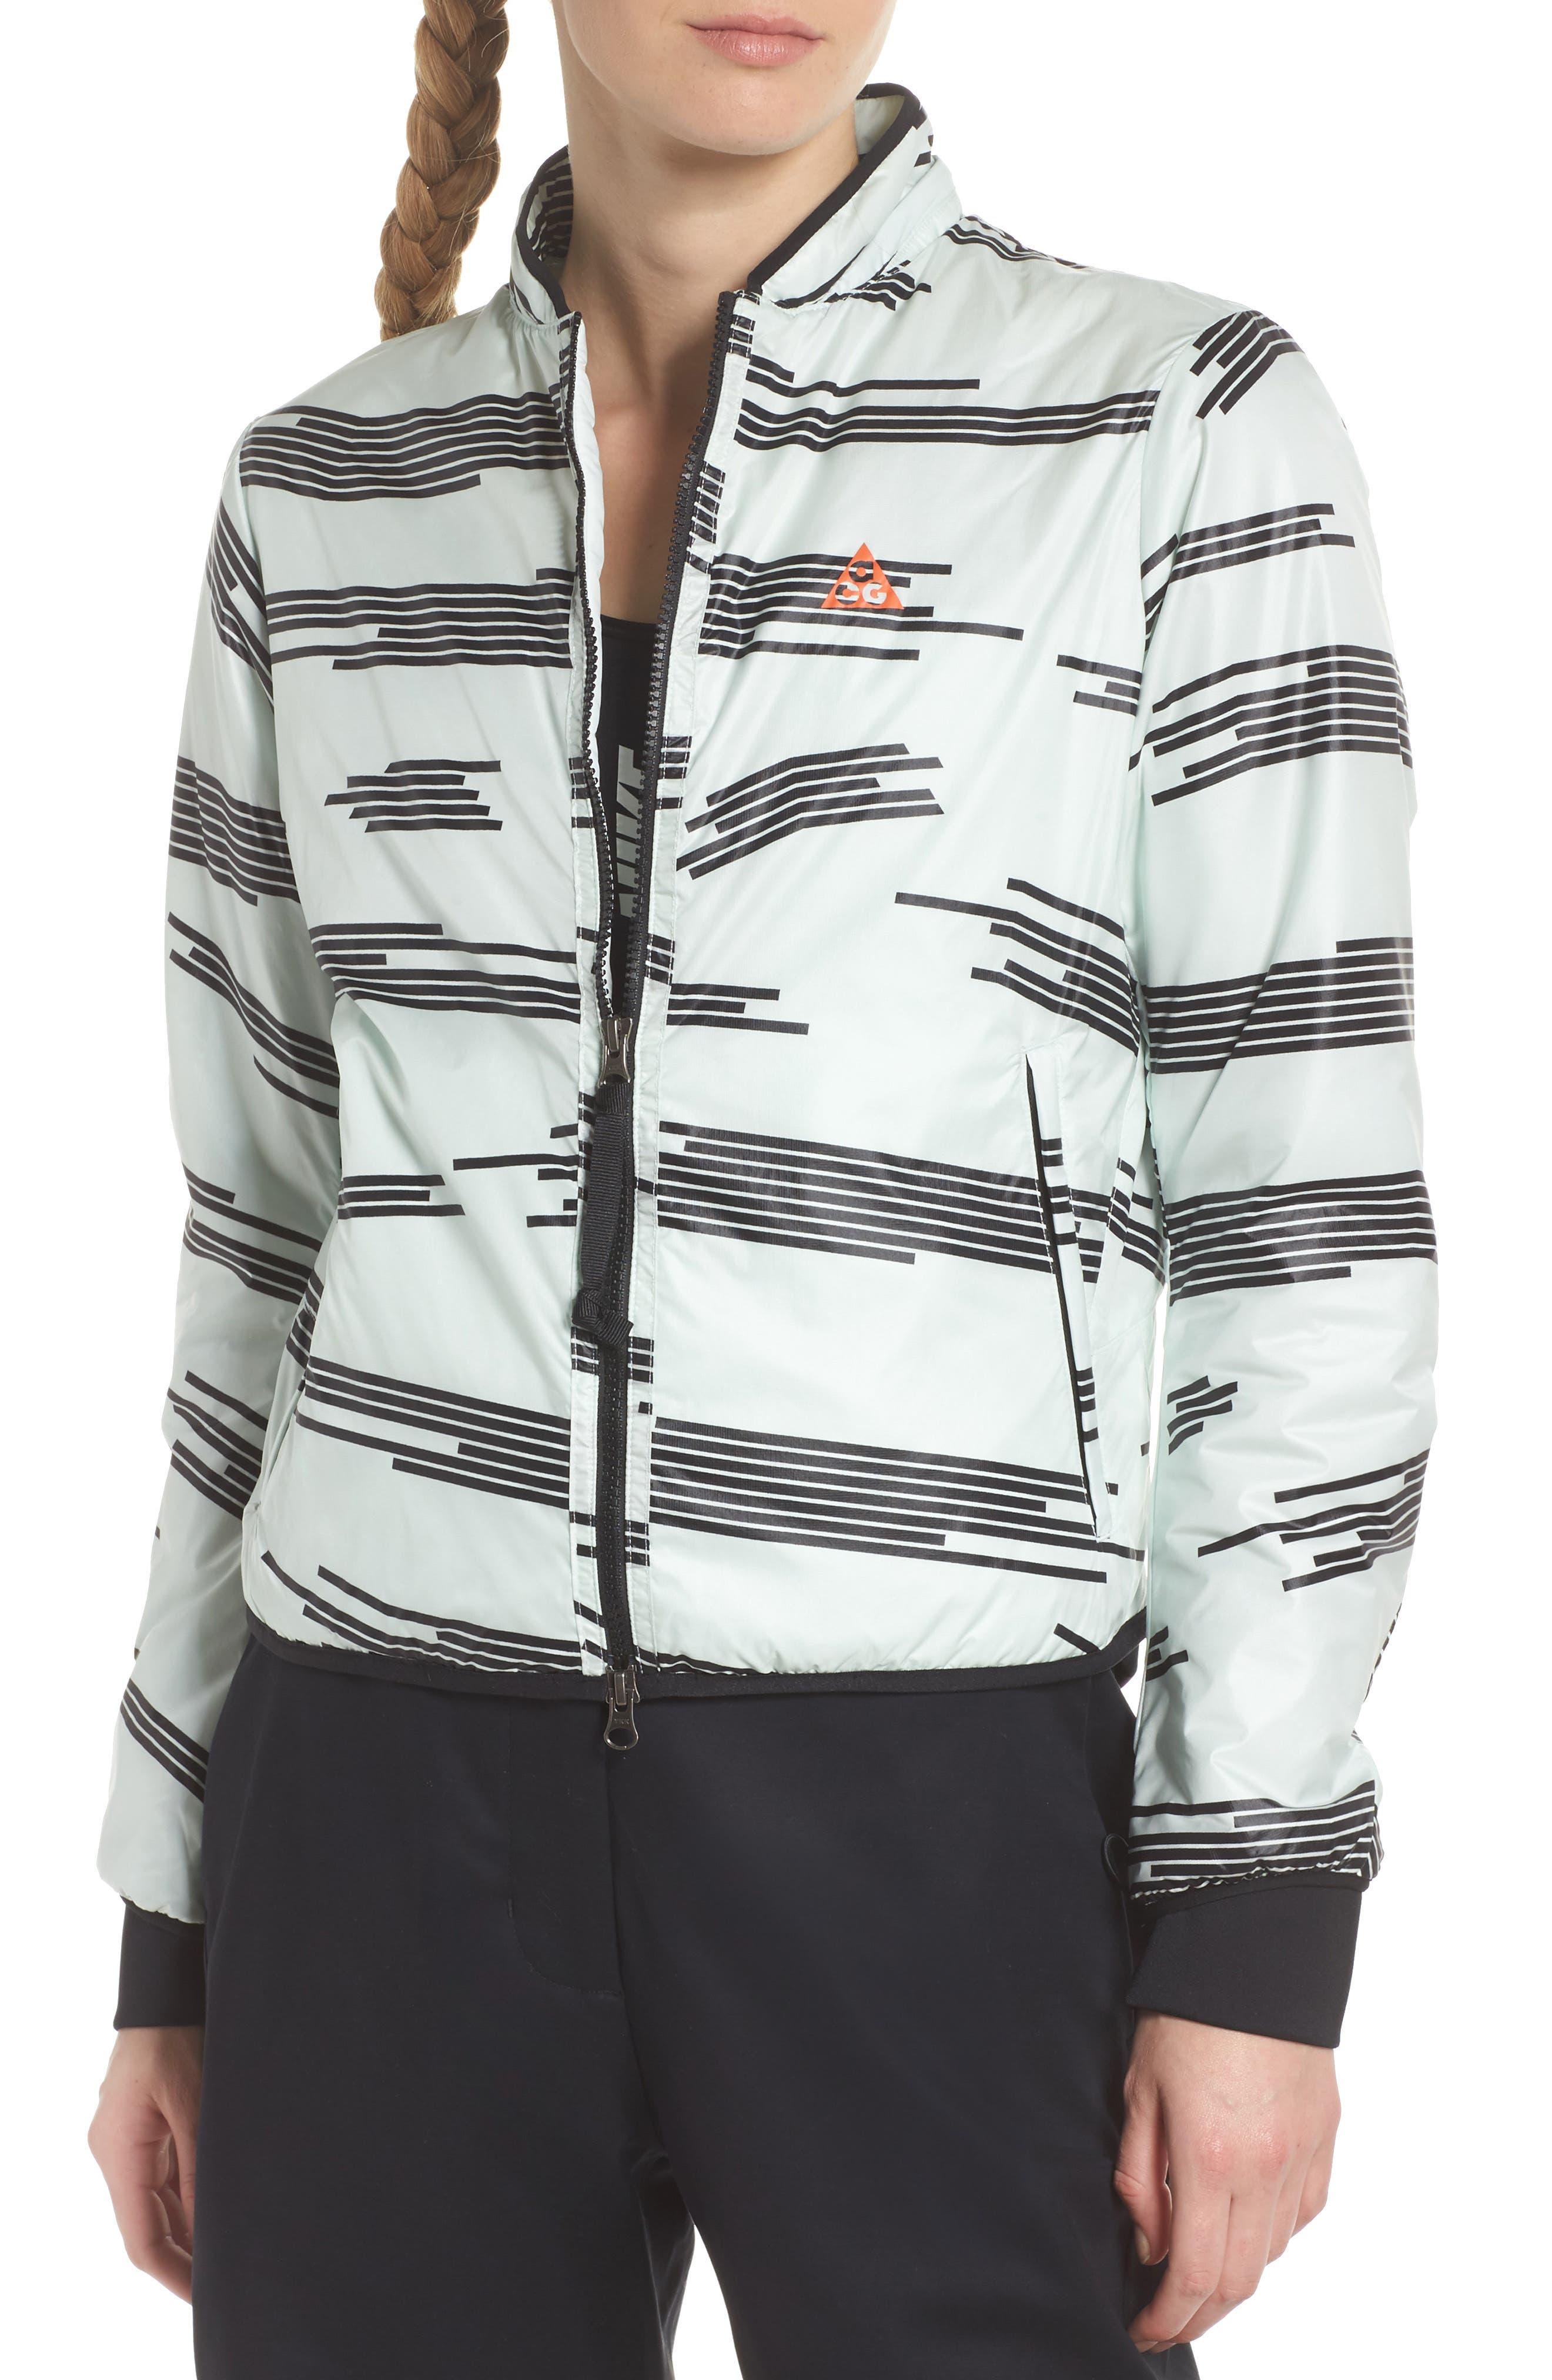 NikeLab ACG 3-in-1 System Women's Coat,                             Alternate thumbnail 6, color,                             010